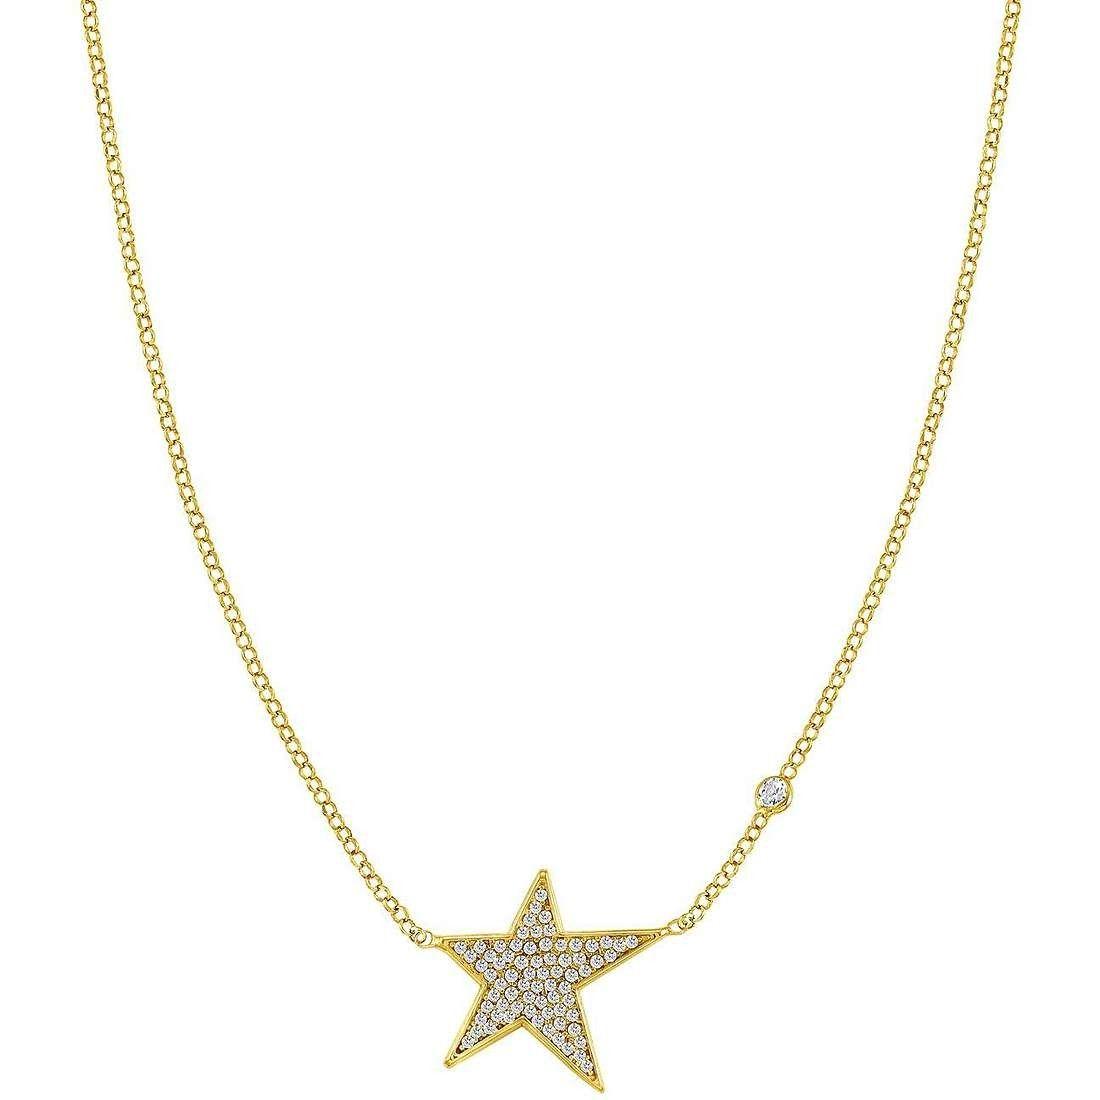 Nomination collana argento ref. 146709/012